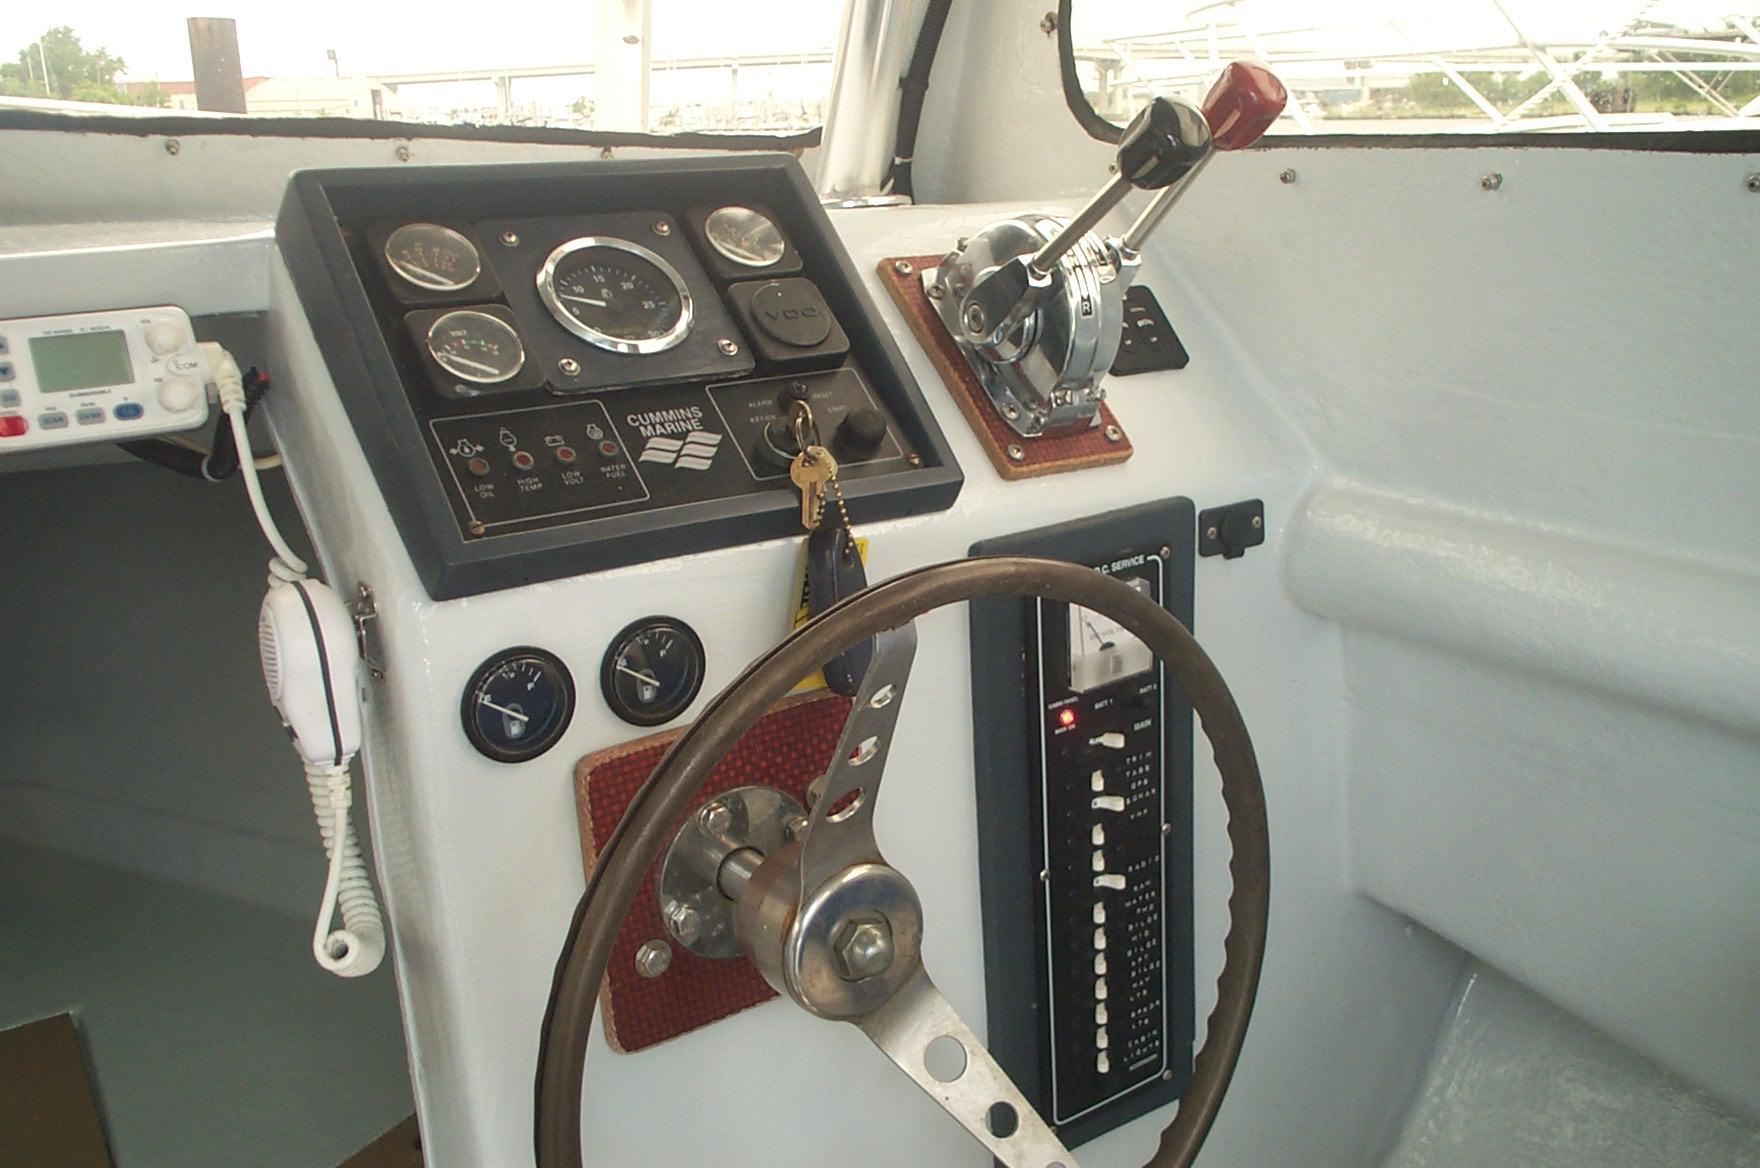 25' Kencraft Buxton Pilot House/Cummins Diesel/Tuna Tower w/ Controls-picture-021-jpg